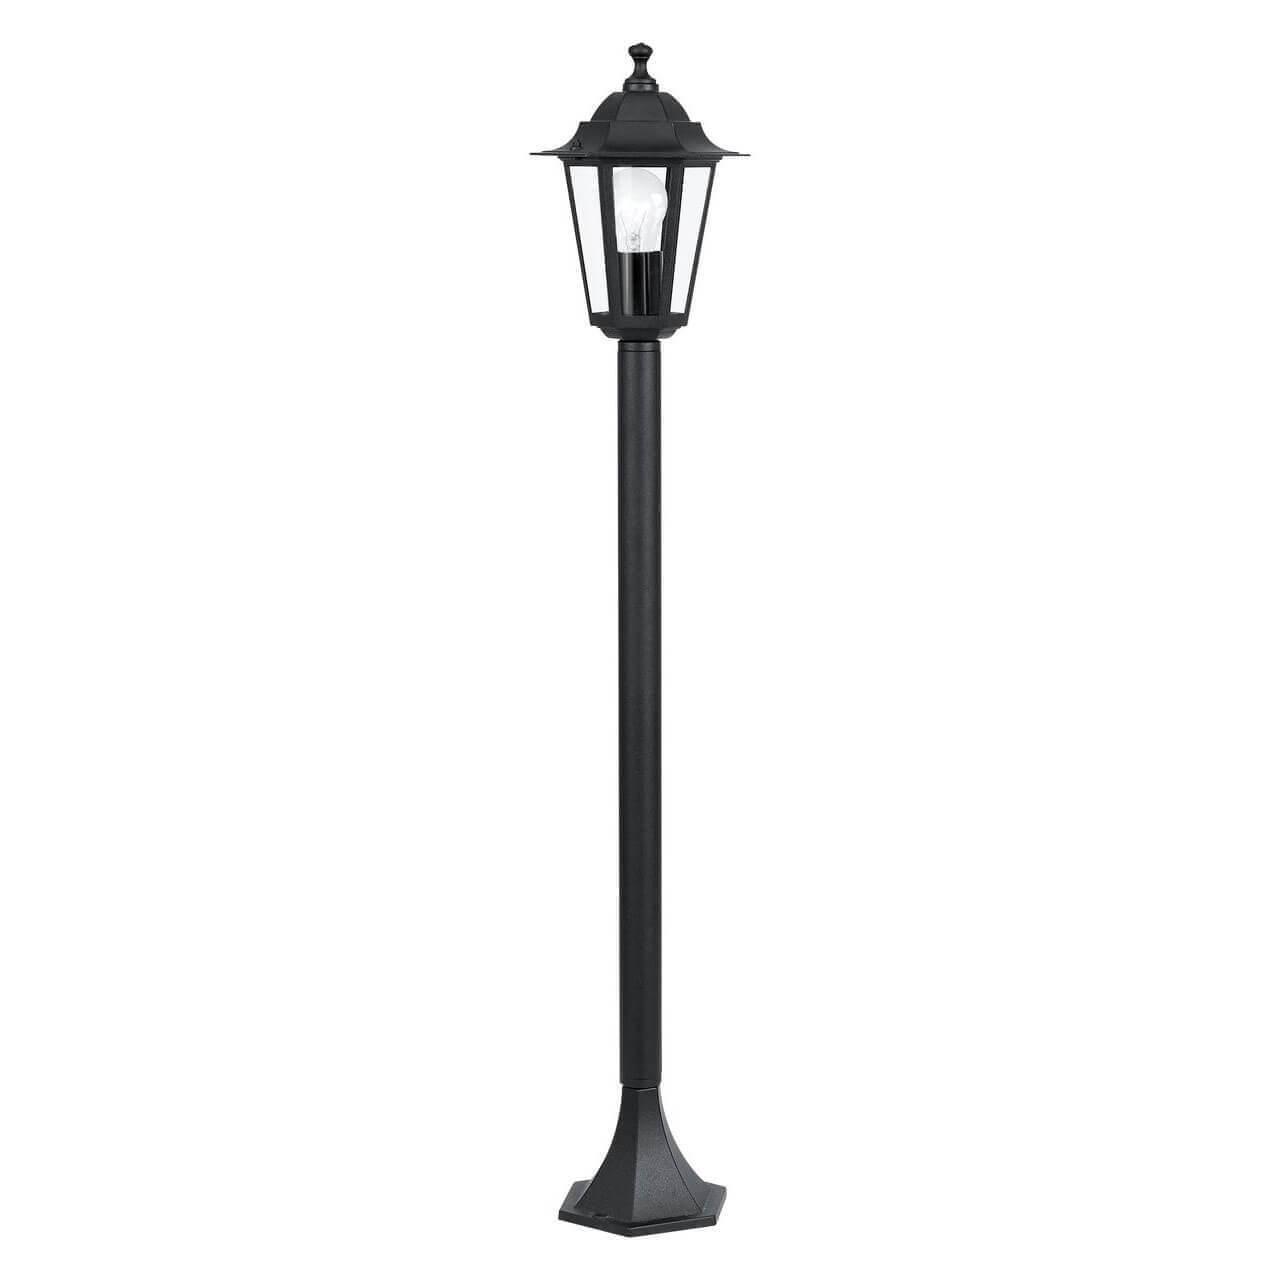 Светильник Eglo 22144 Laterna цена 2017